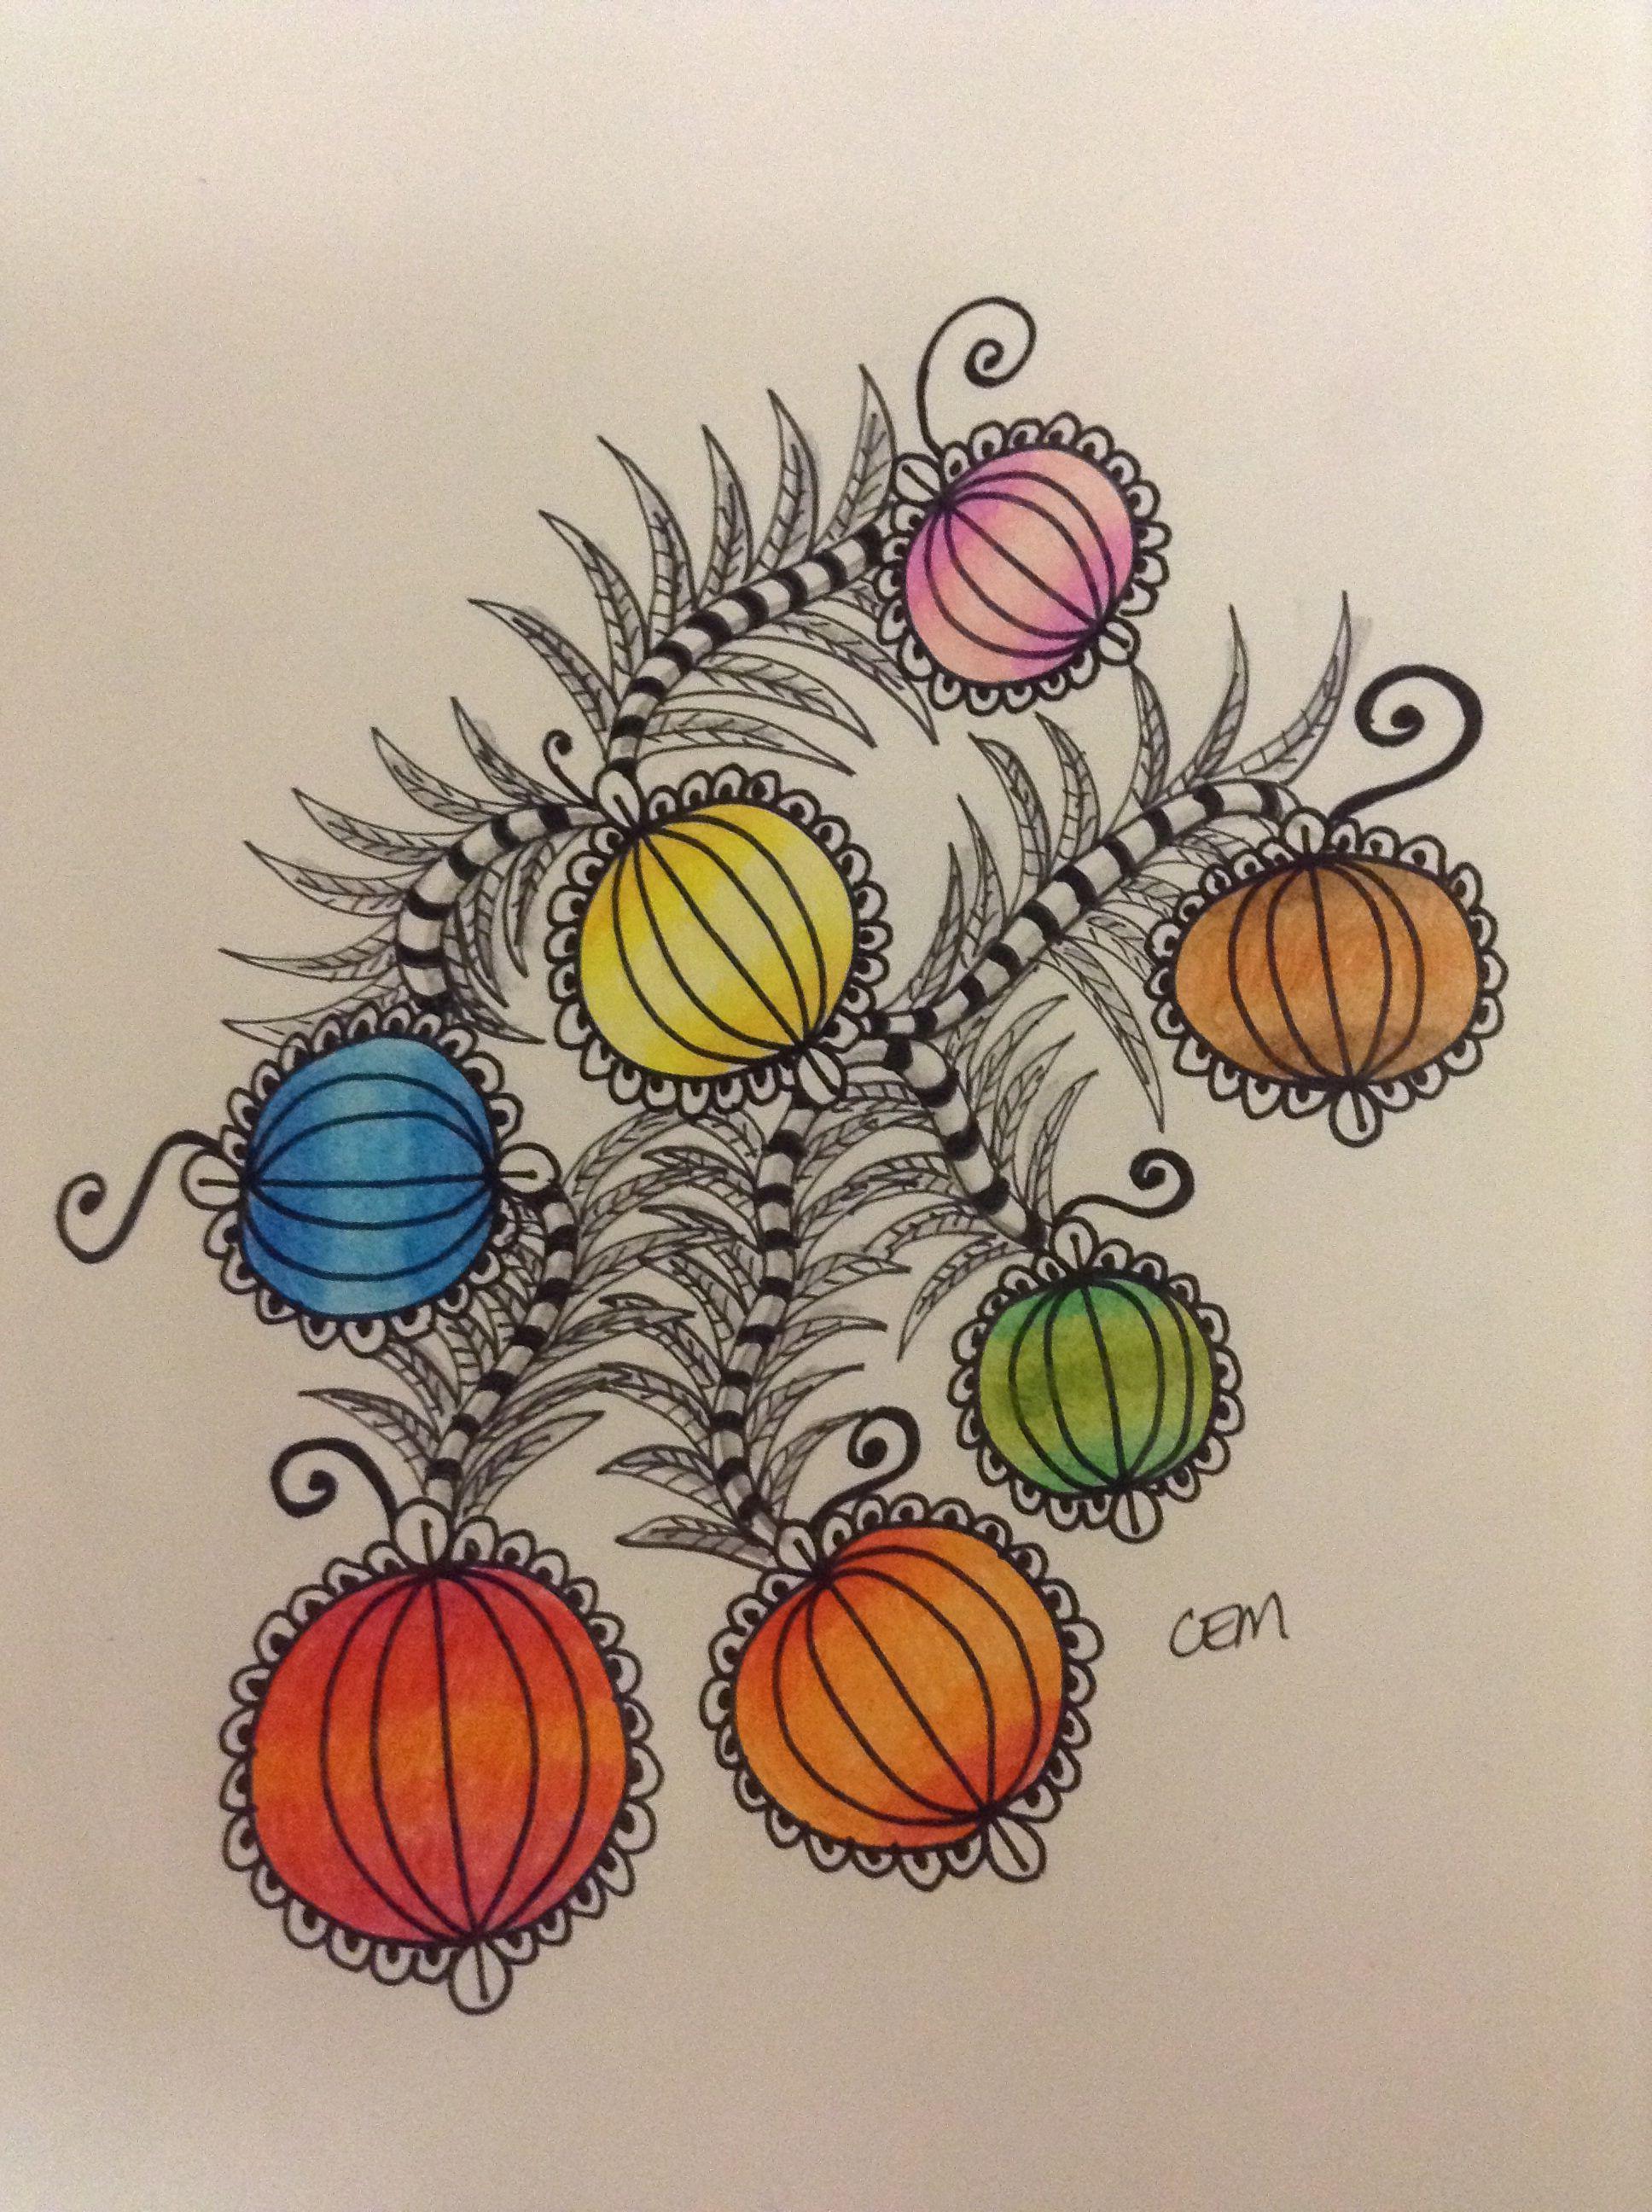 - #zentangle #zendoodle #art #drawing #pen #sharpie #graphite more at www.facebook.com/ChrissieMurphyDesigns